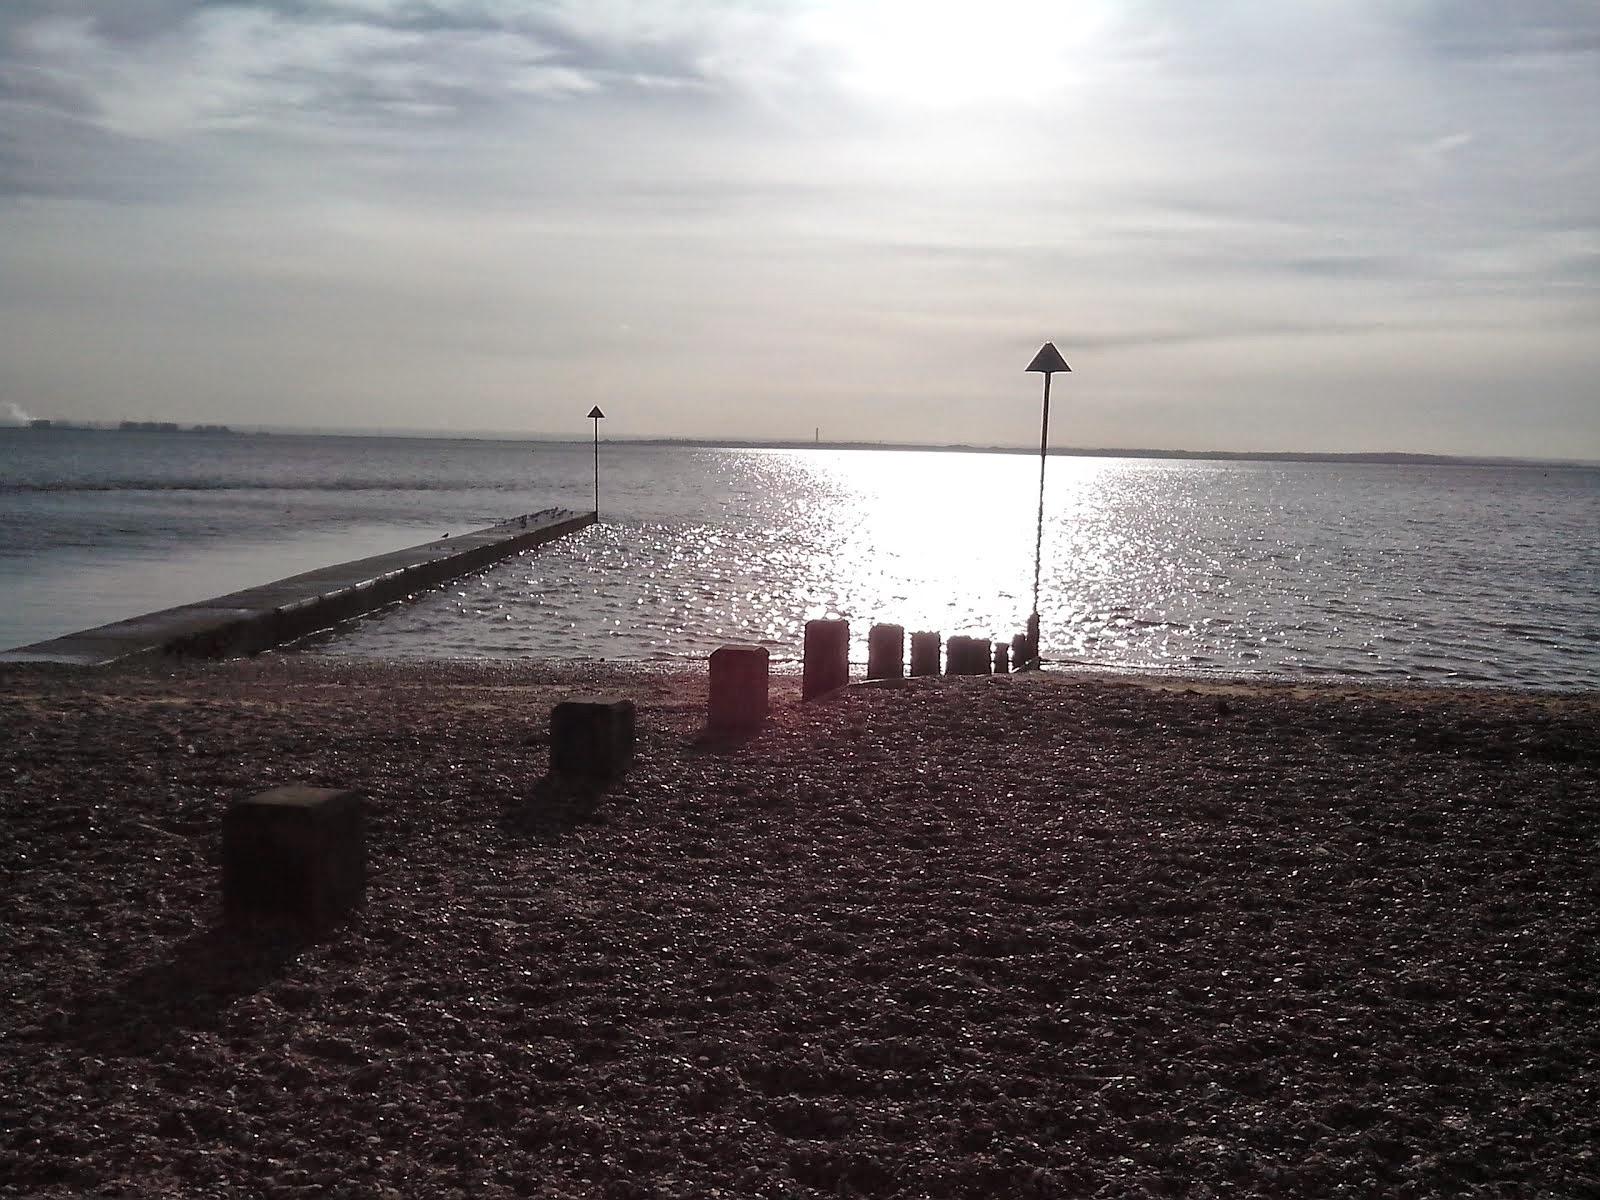 CHALKWELL BEACH, Essex, UK